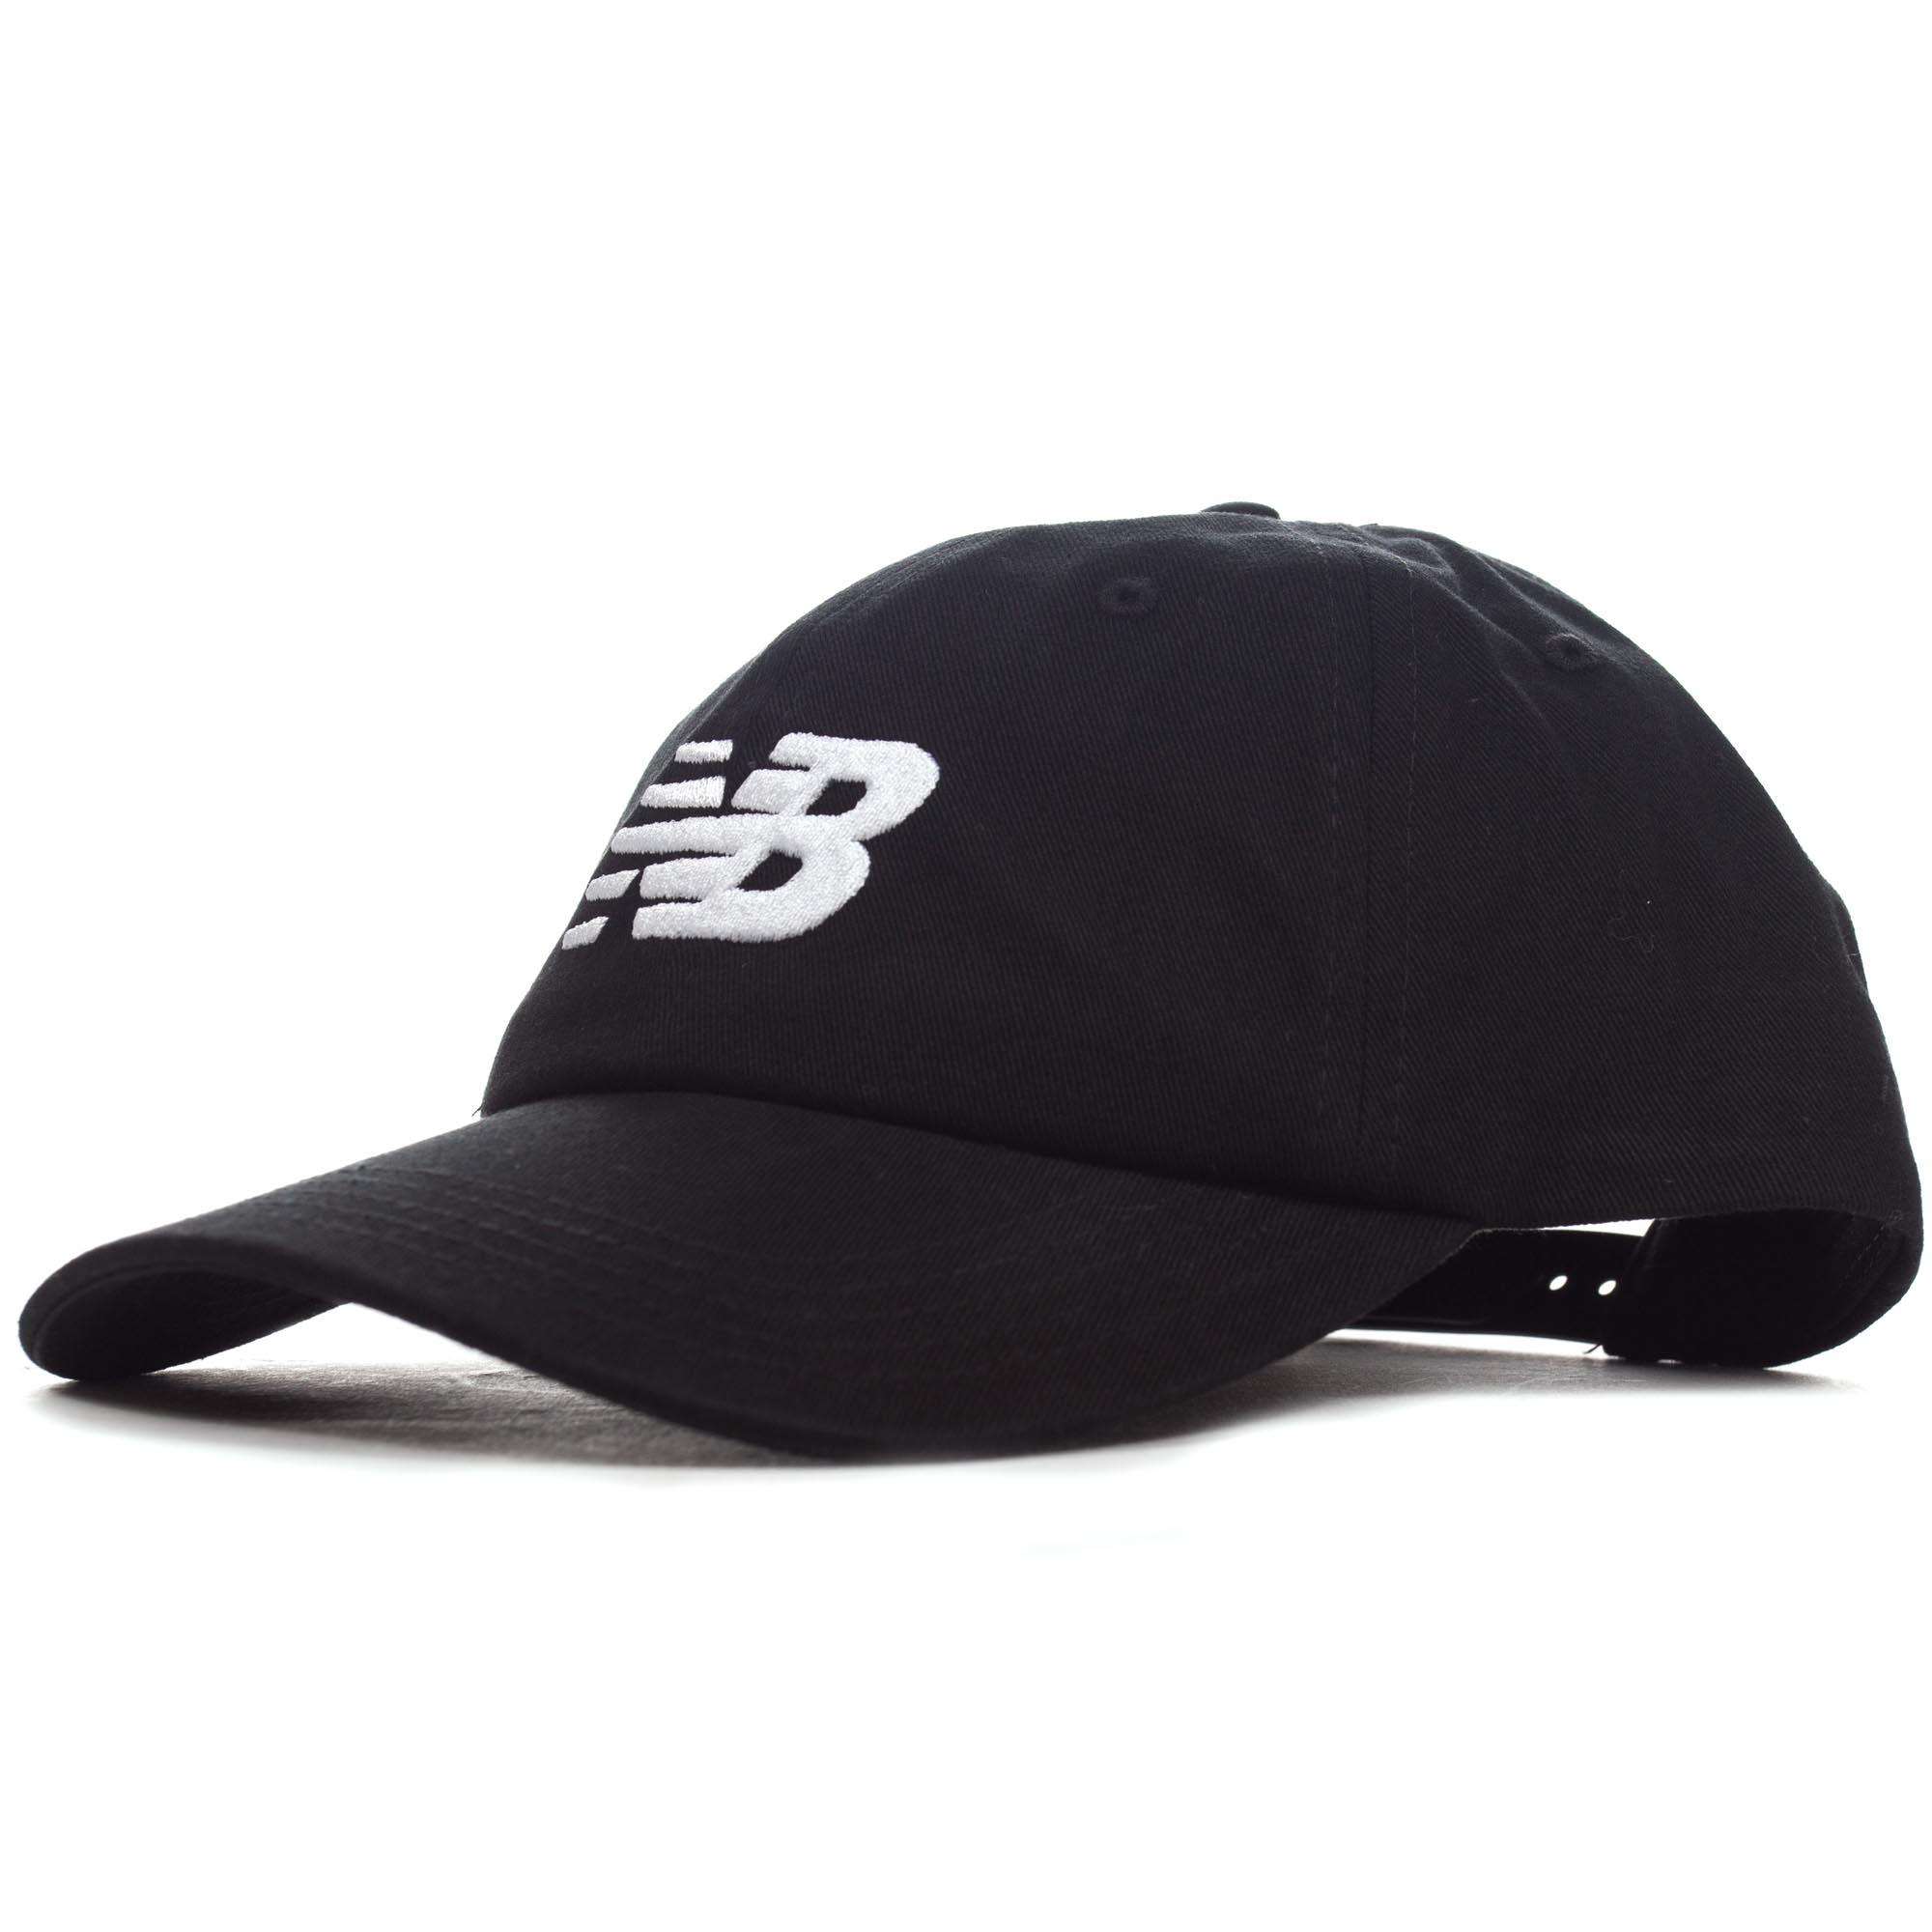 0e1cf010e20 Details about New Balance Mens 6-Panel Curved Brim Snapback Baseball Cap Hat  - Navy Blue